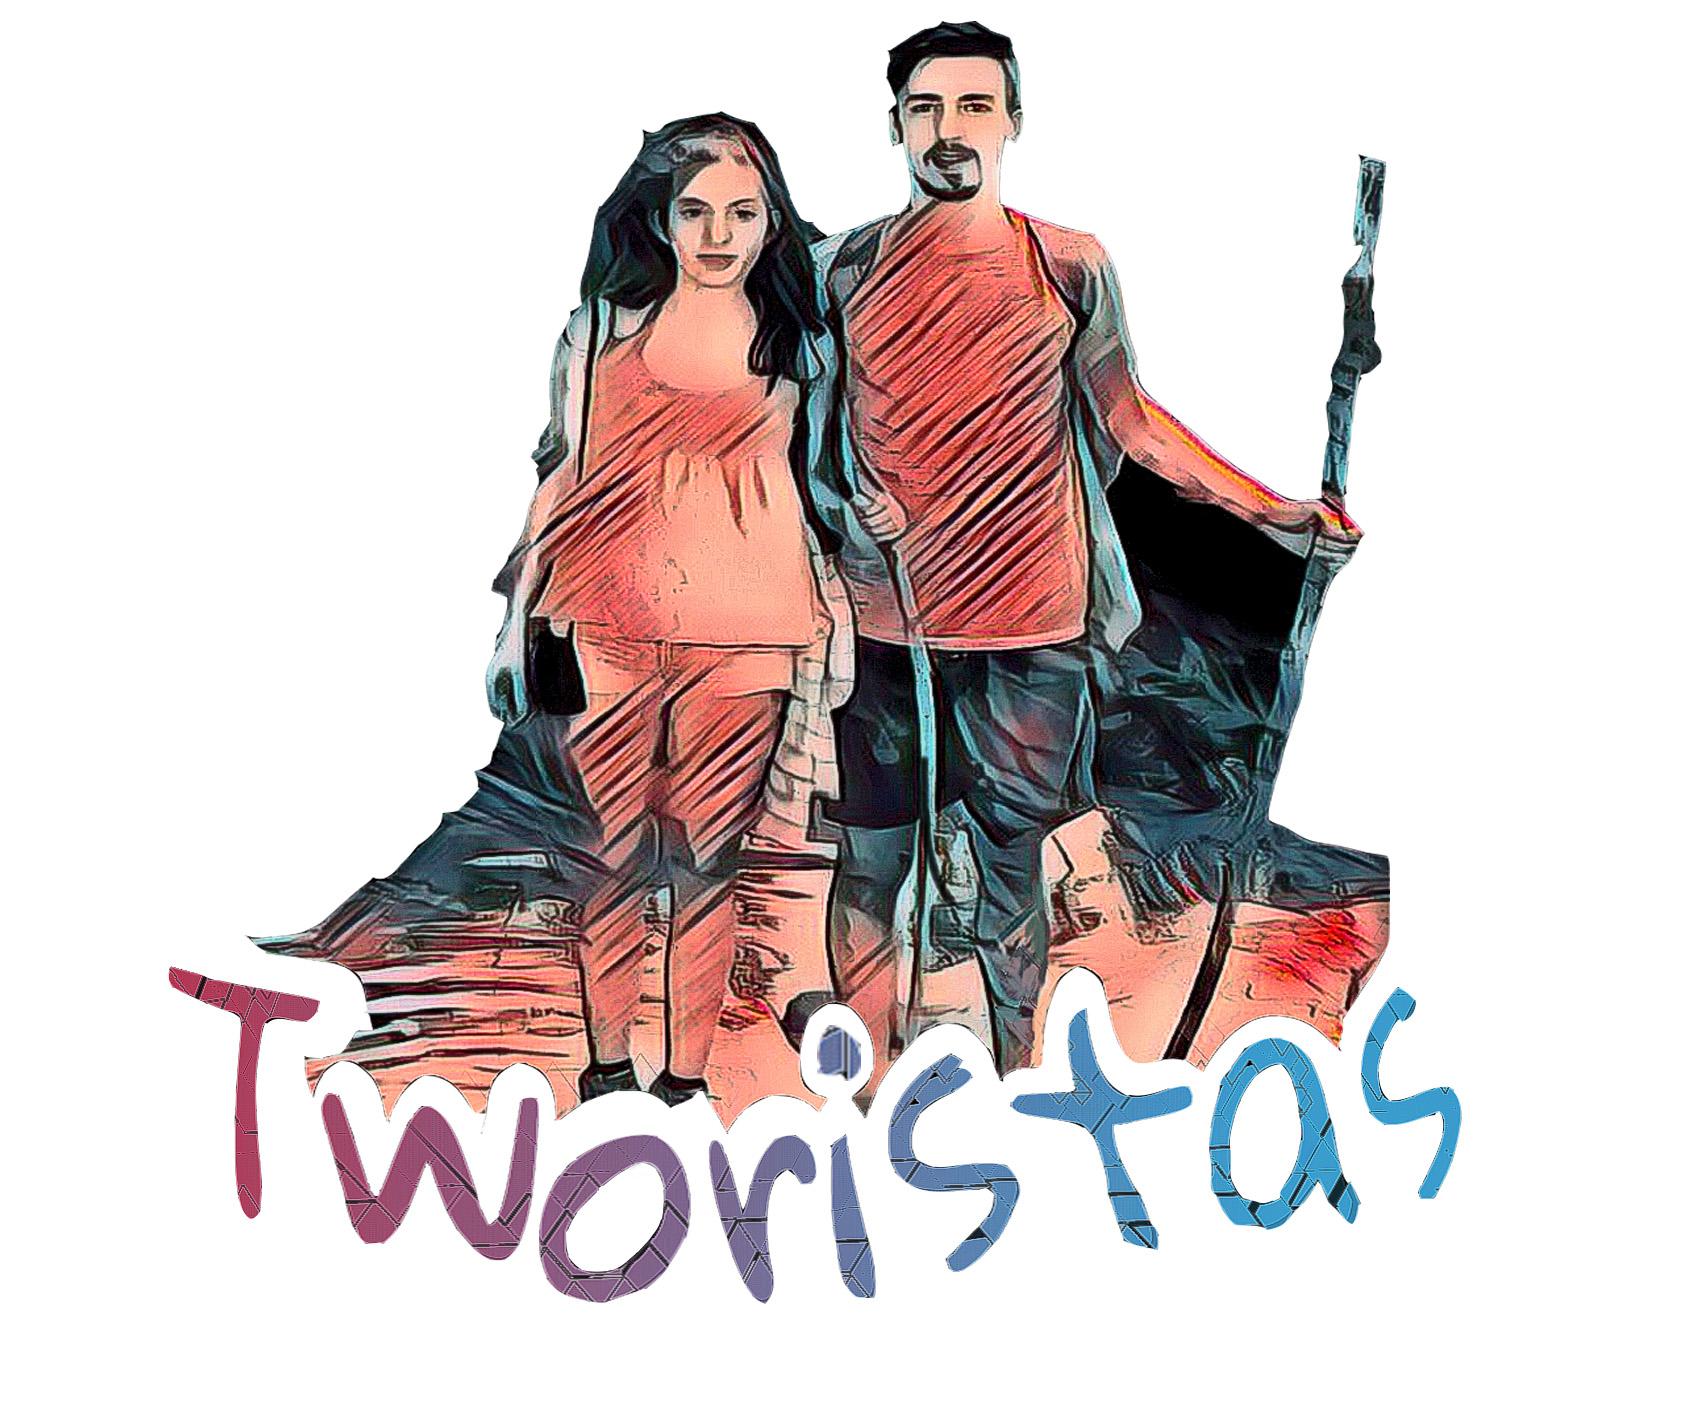 Tworistas